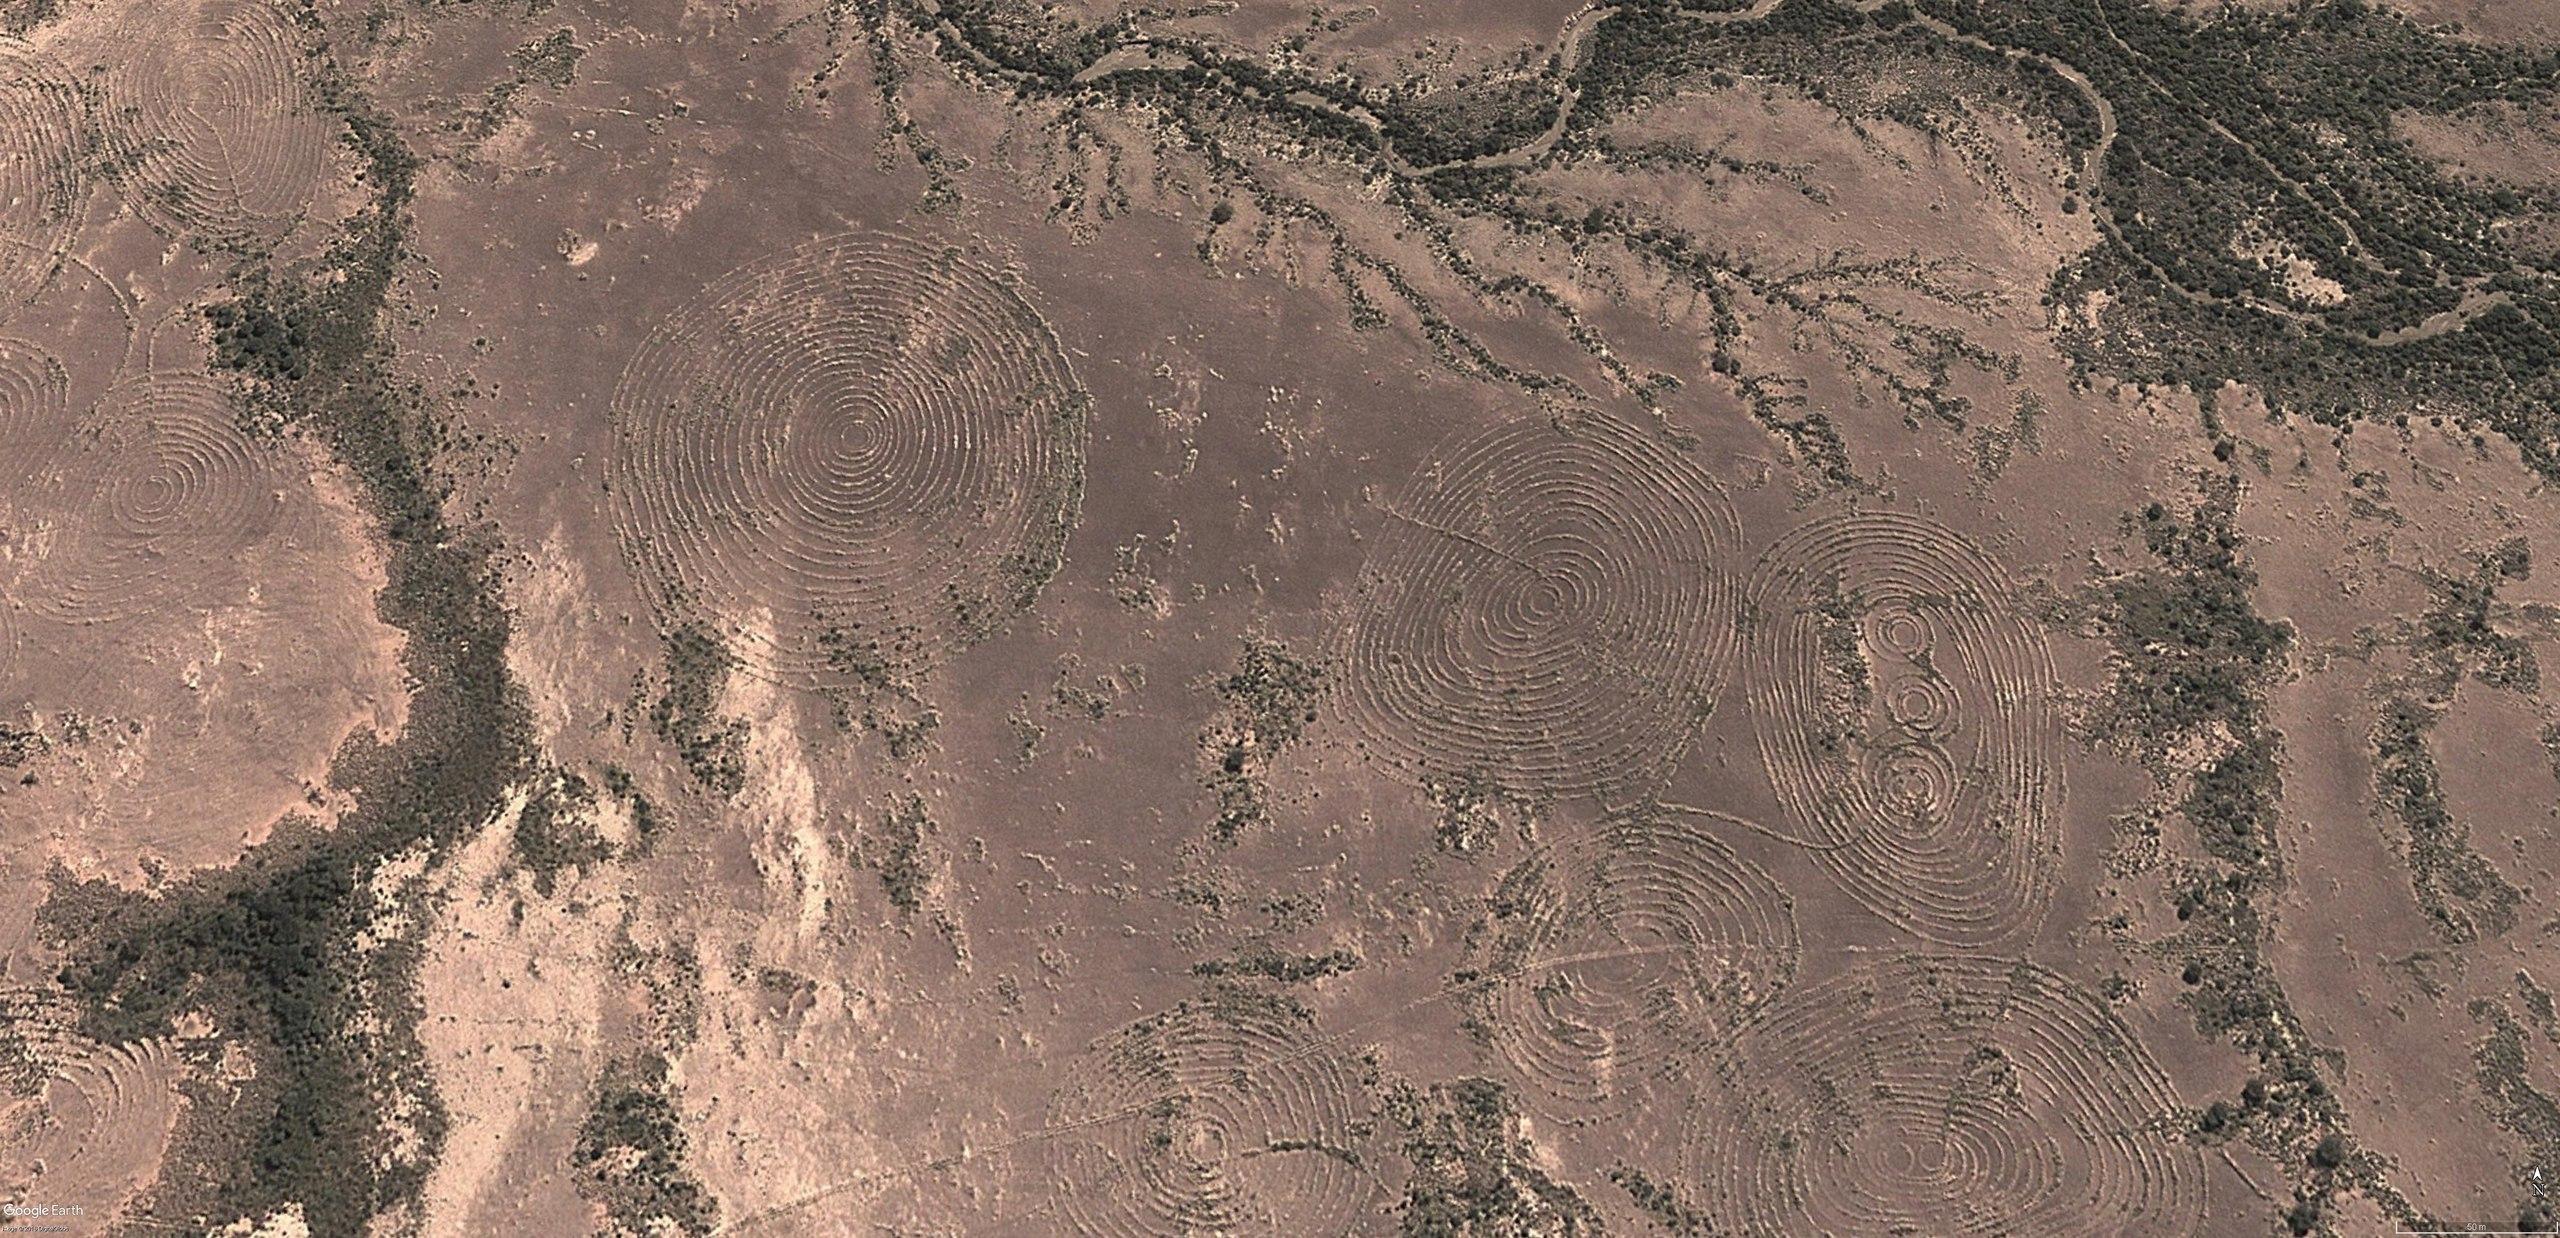 Намибия геоглифы круги мегалиты менгиры Африка